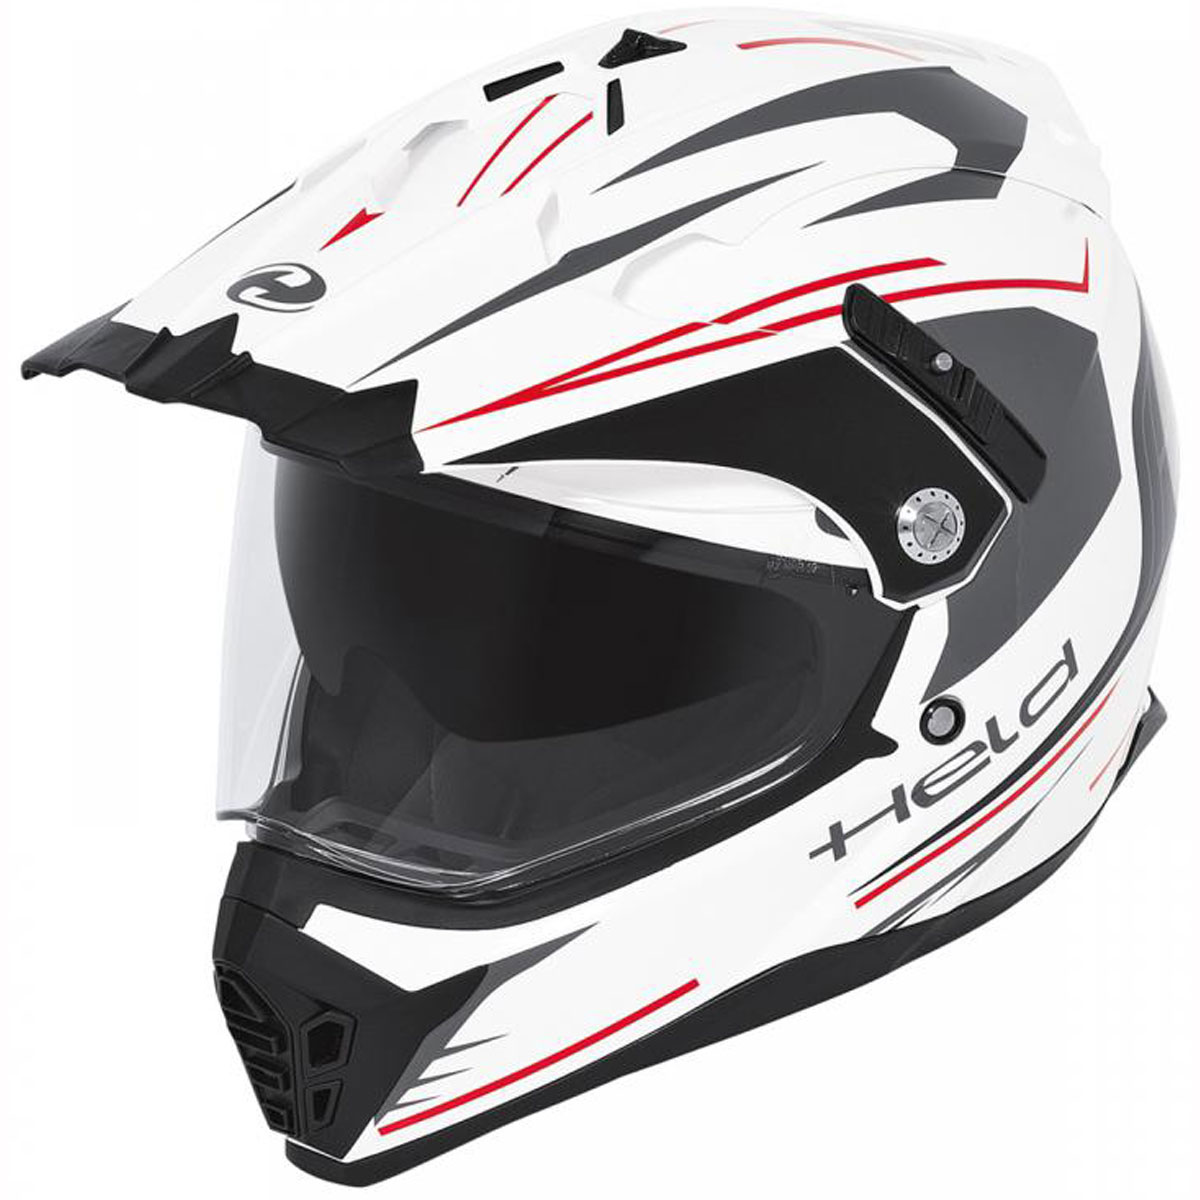 Top 10 best motorcycle helmets under £250